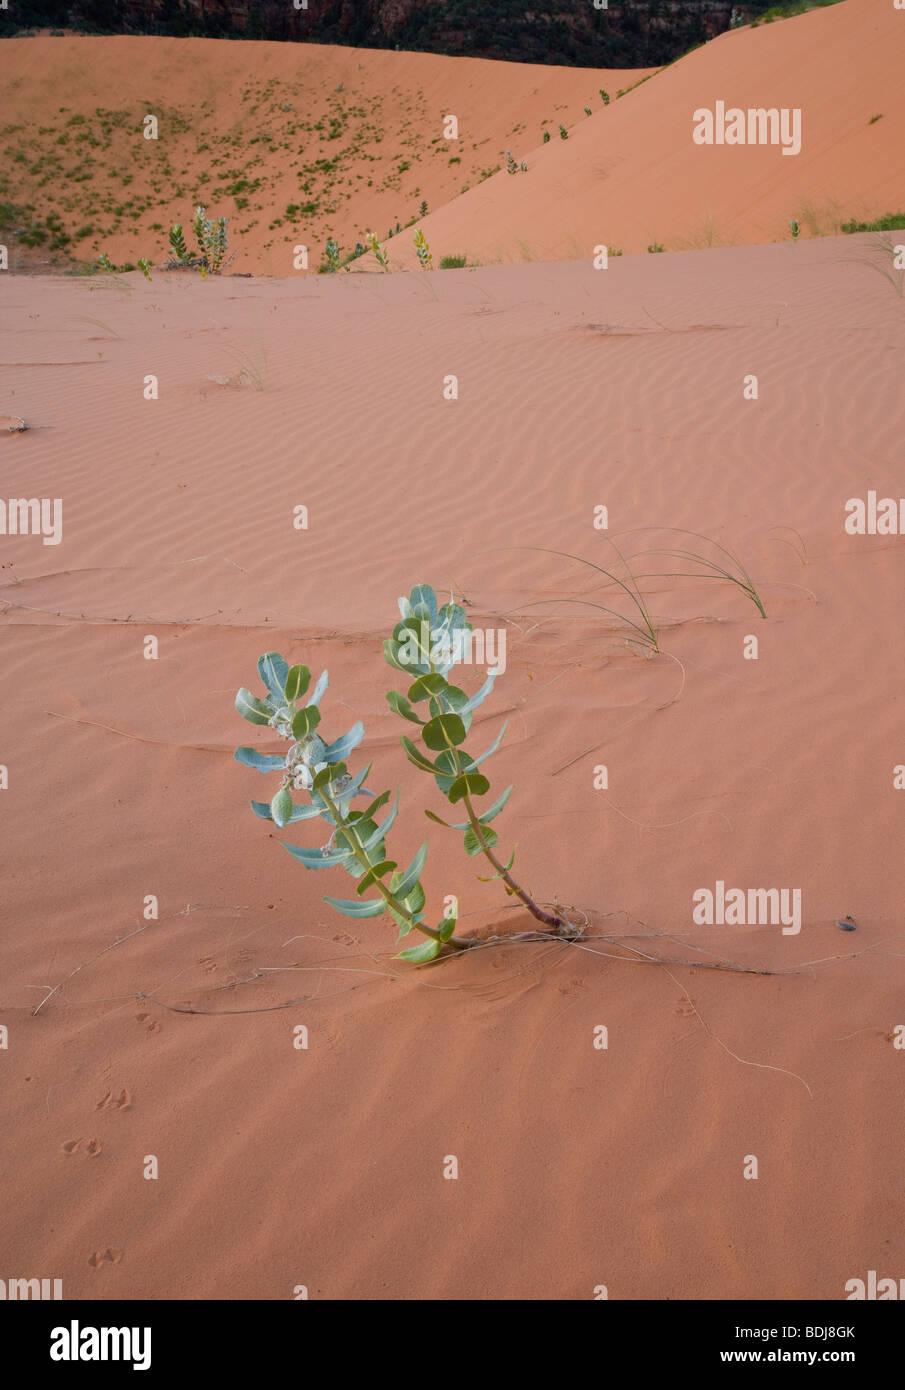 Welsh's Milkweed (Asclepias welshii) on sand dune - Stock Image